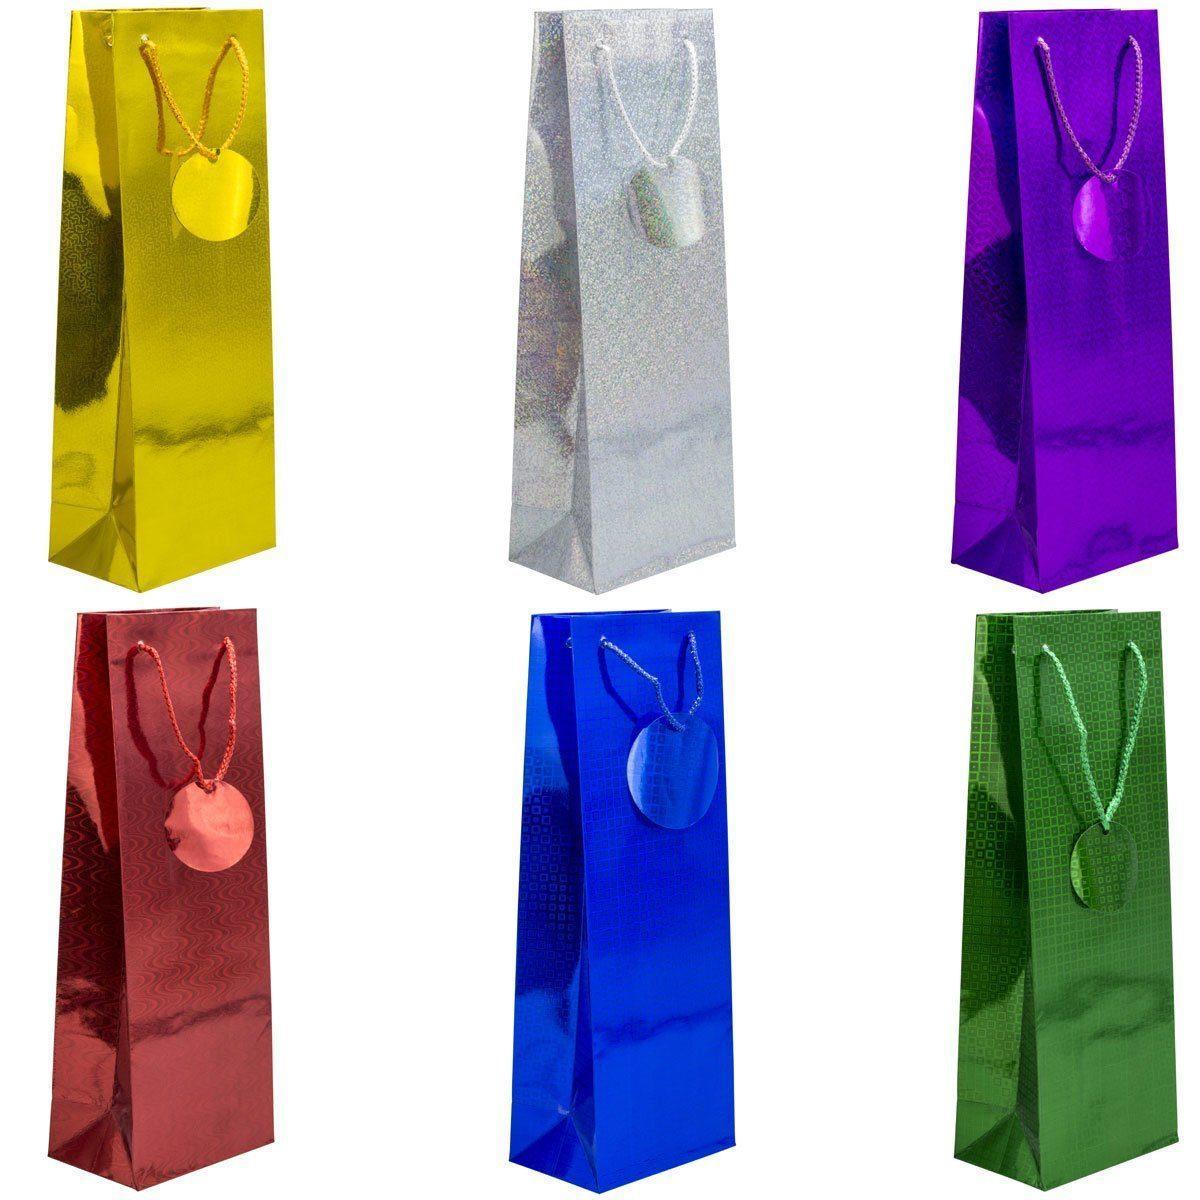 Пакет подарунковий паперовий для пляшки голограма 36*12*10 см